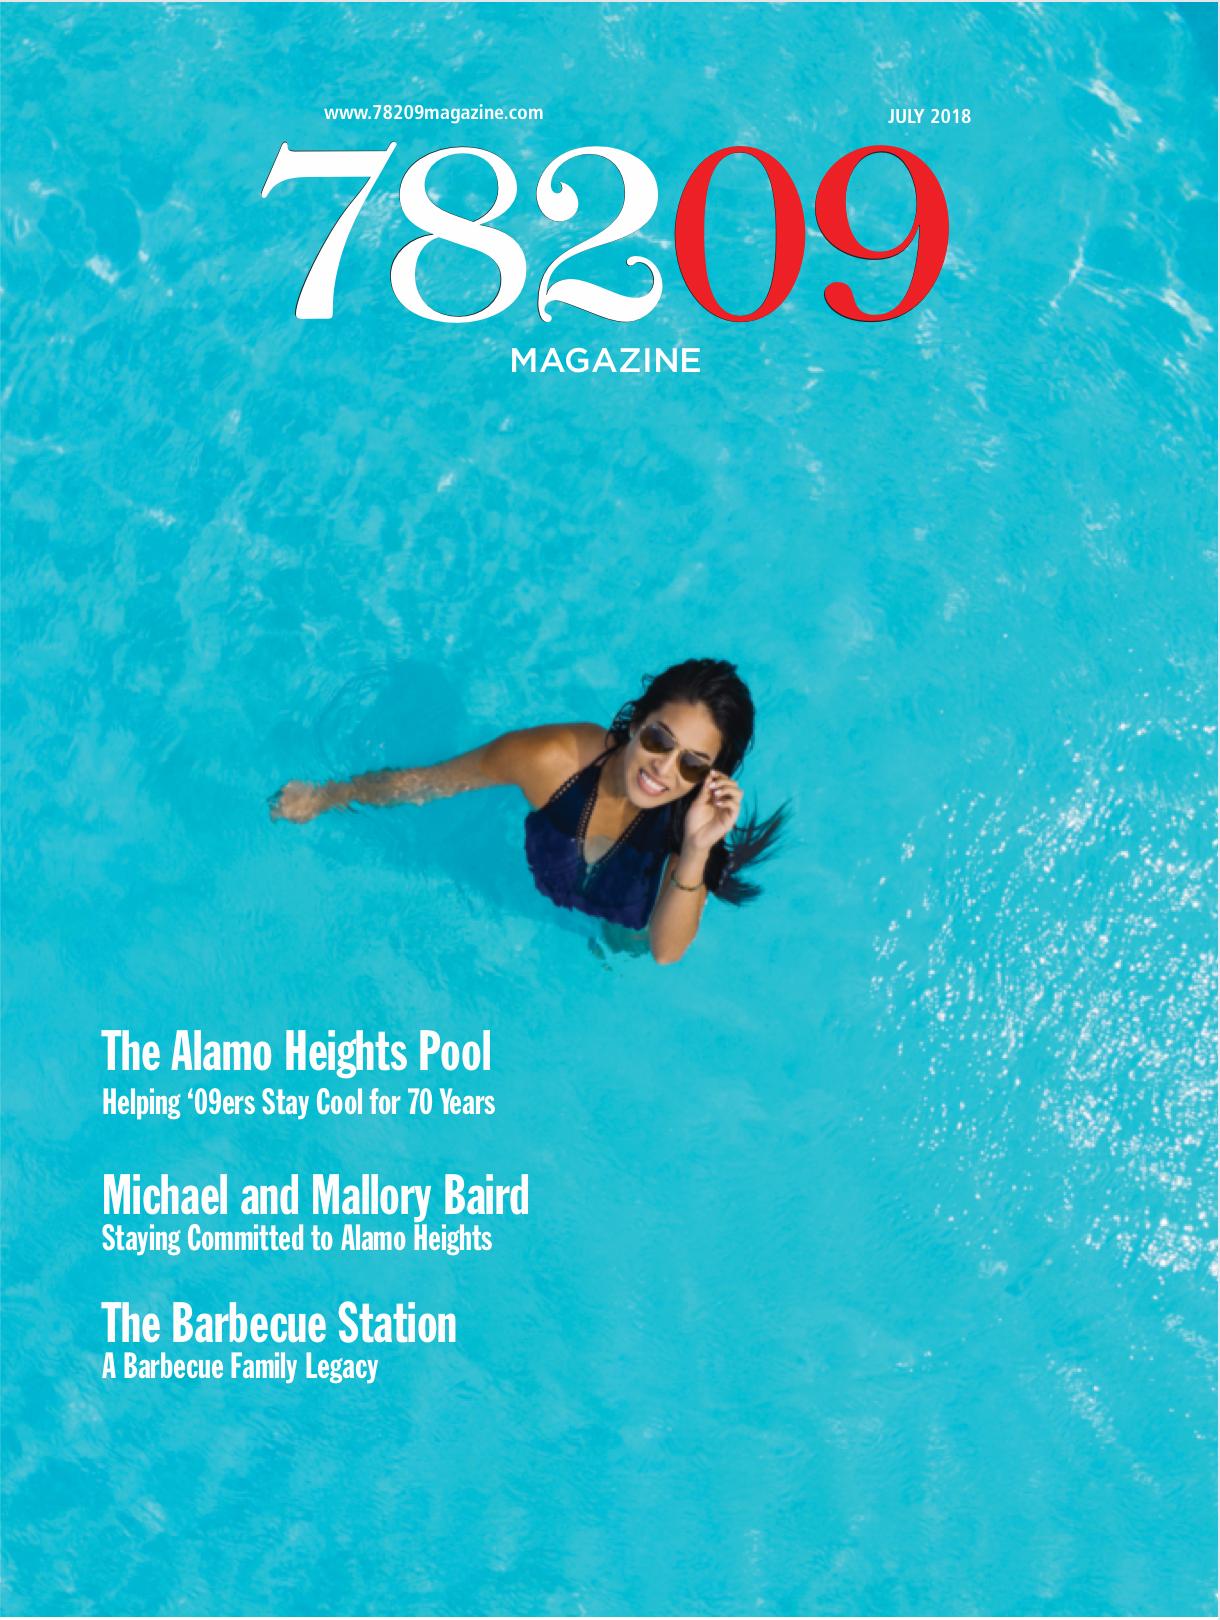 78209 Magazine July 2018